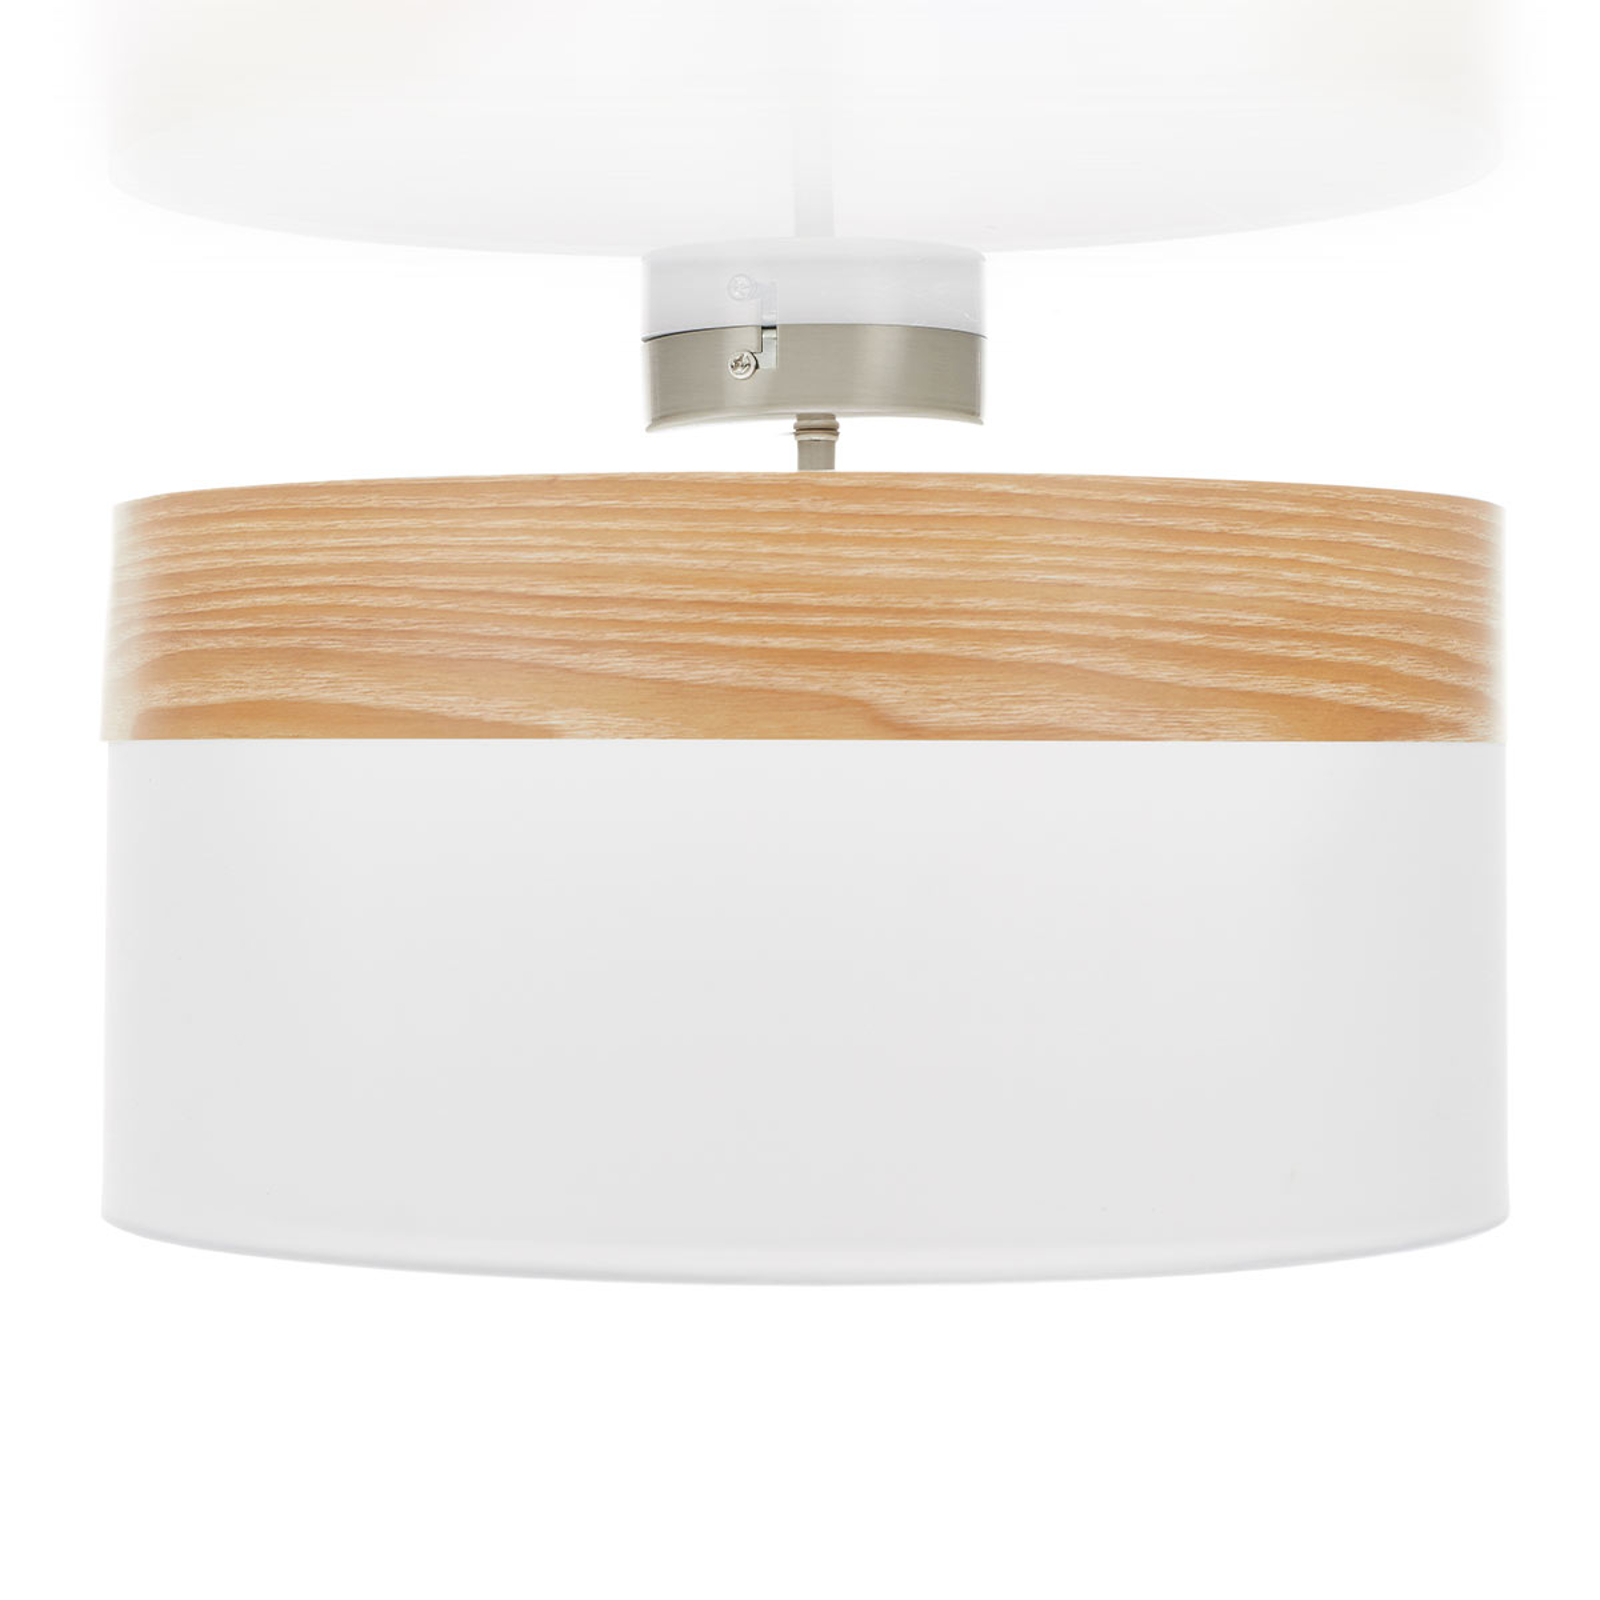 Afstand plafondlamp Libba crème-hout